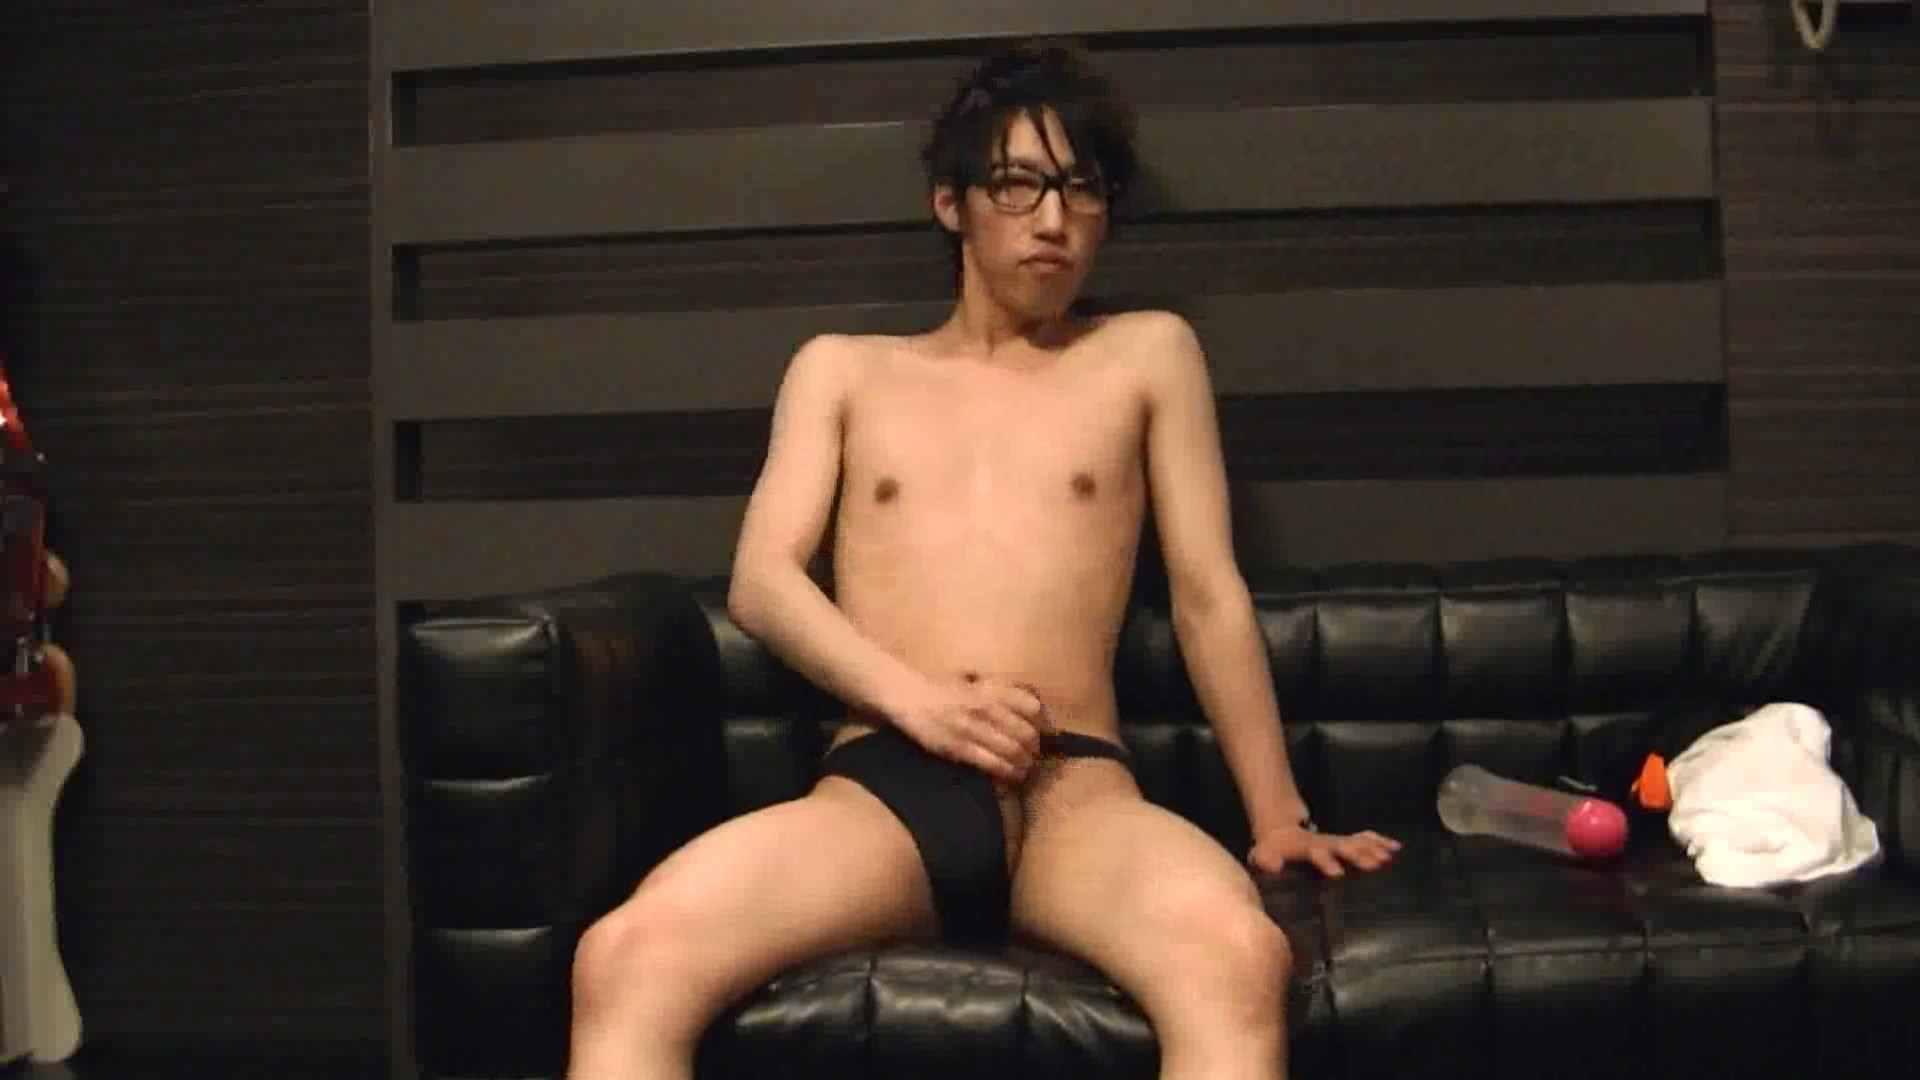 ONA見せカーニバル!! Vol3 男 ゲイ無料無修正画像 89枚 35